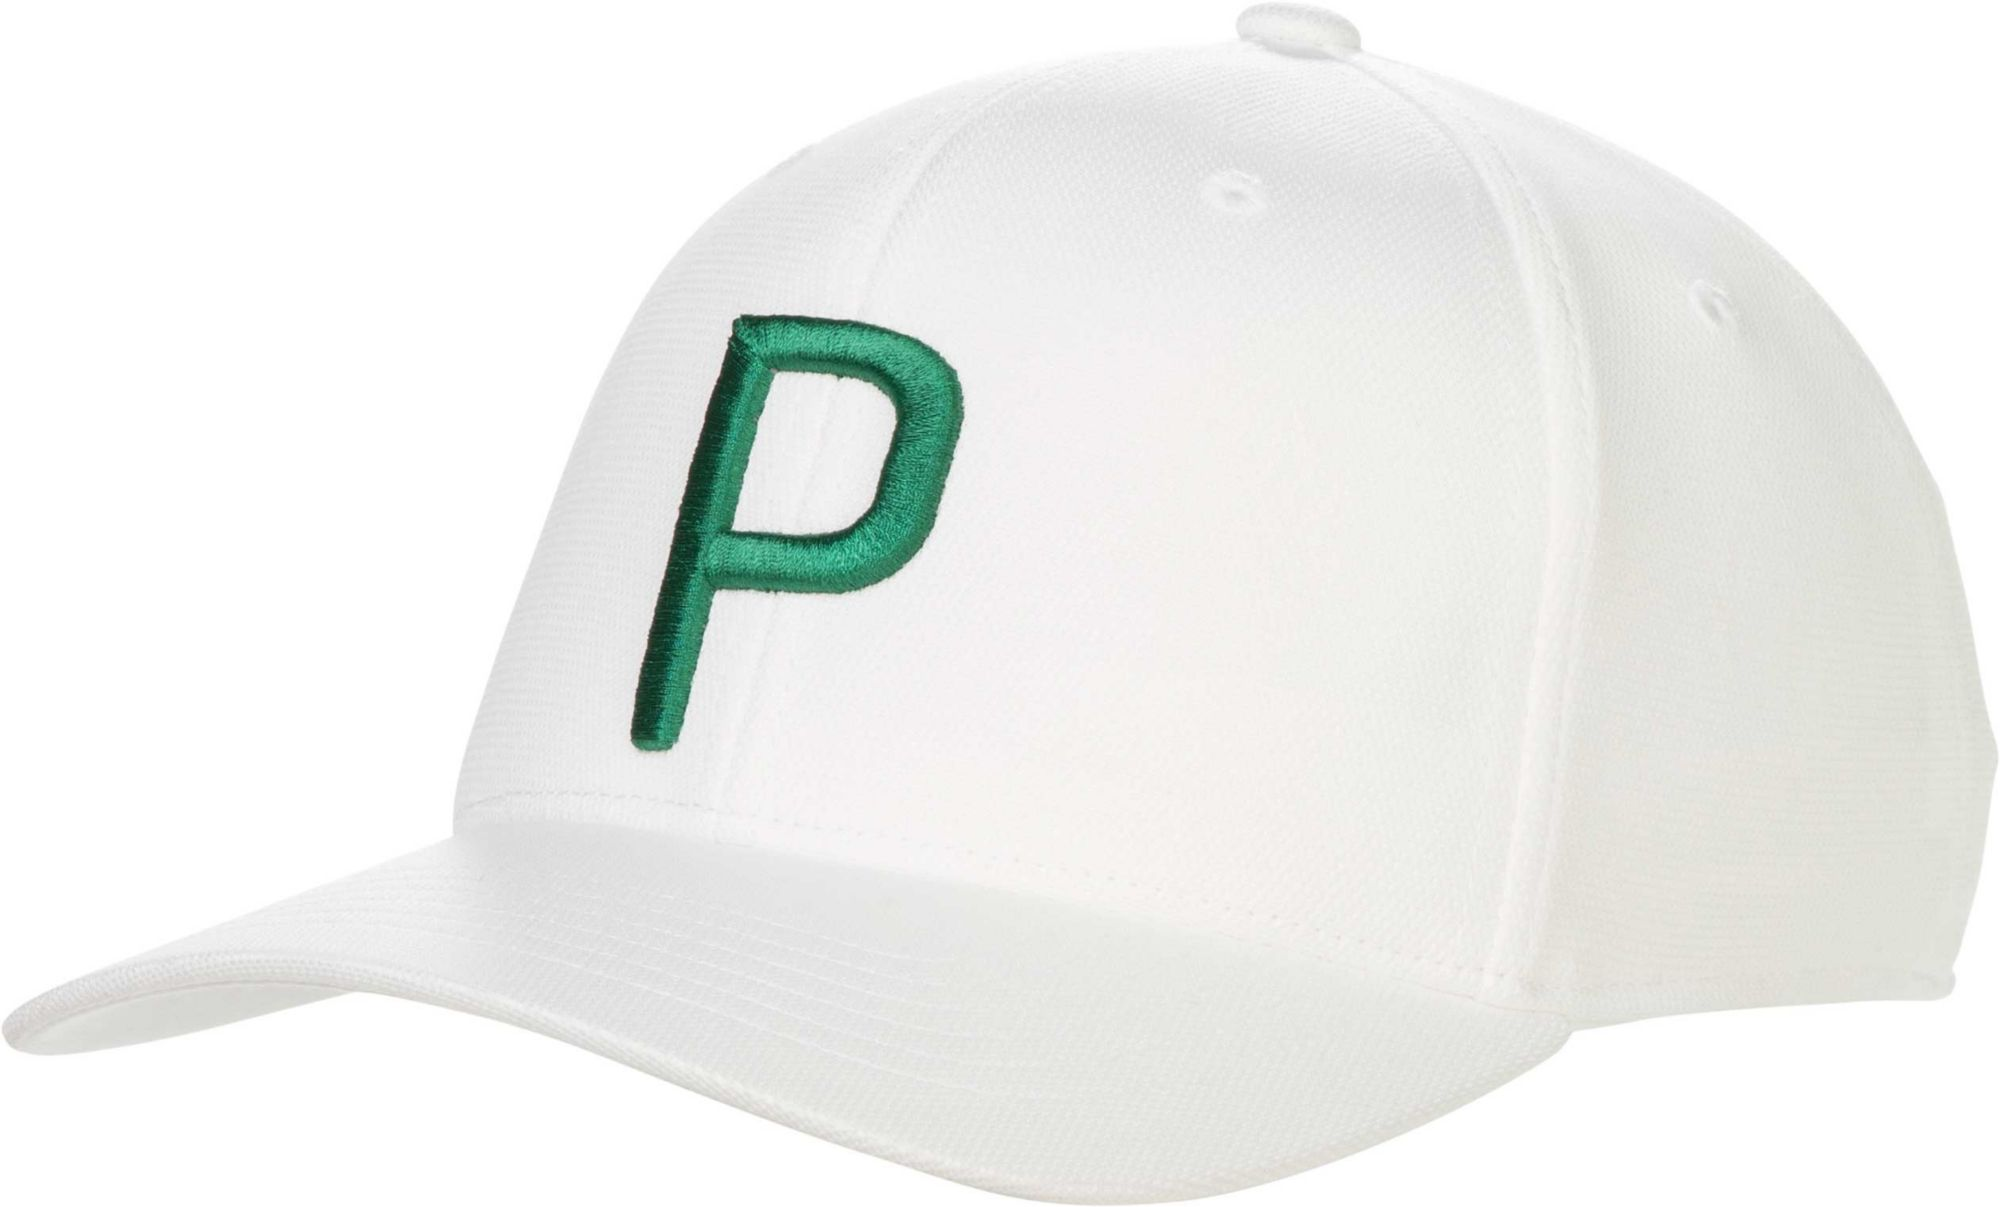 PUMA P 110 Recyclable Snapback Golf Hat  c9f2992260e